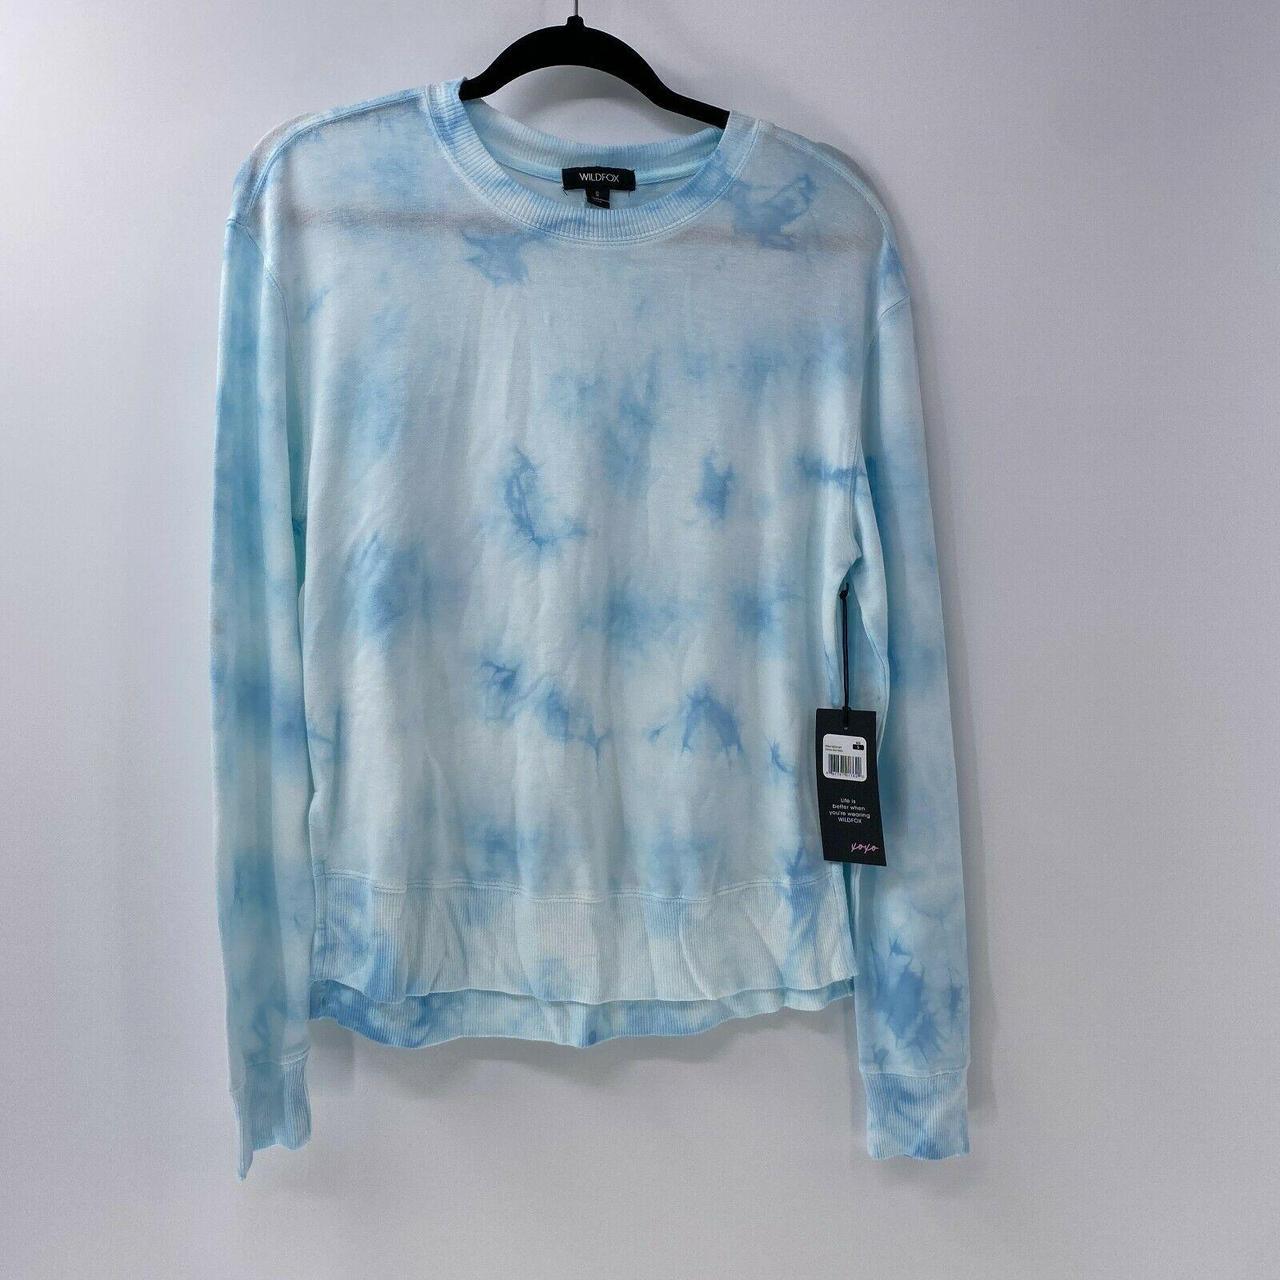 Product Image 1 - Wildfox Sweatshirt Crystal Blue tie